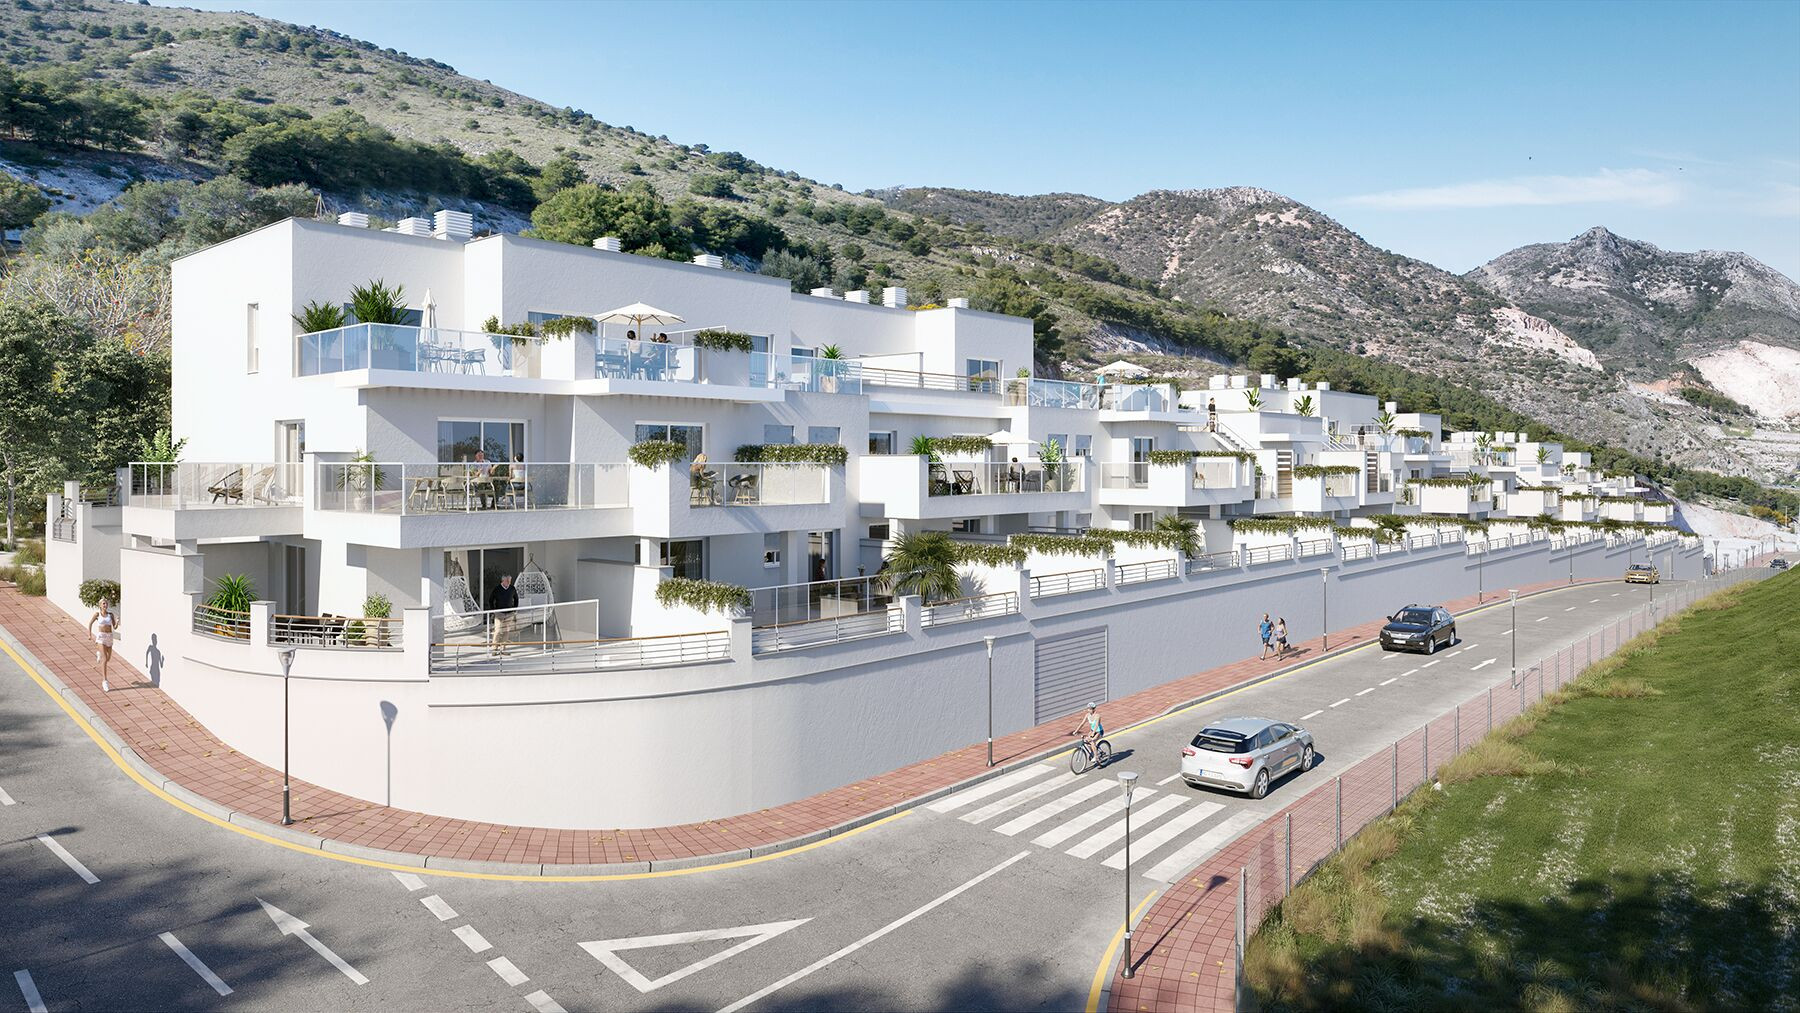 Modern new development of apartments in Benalmádena Pueblo